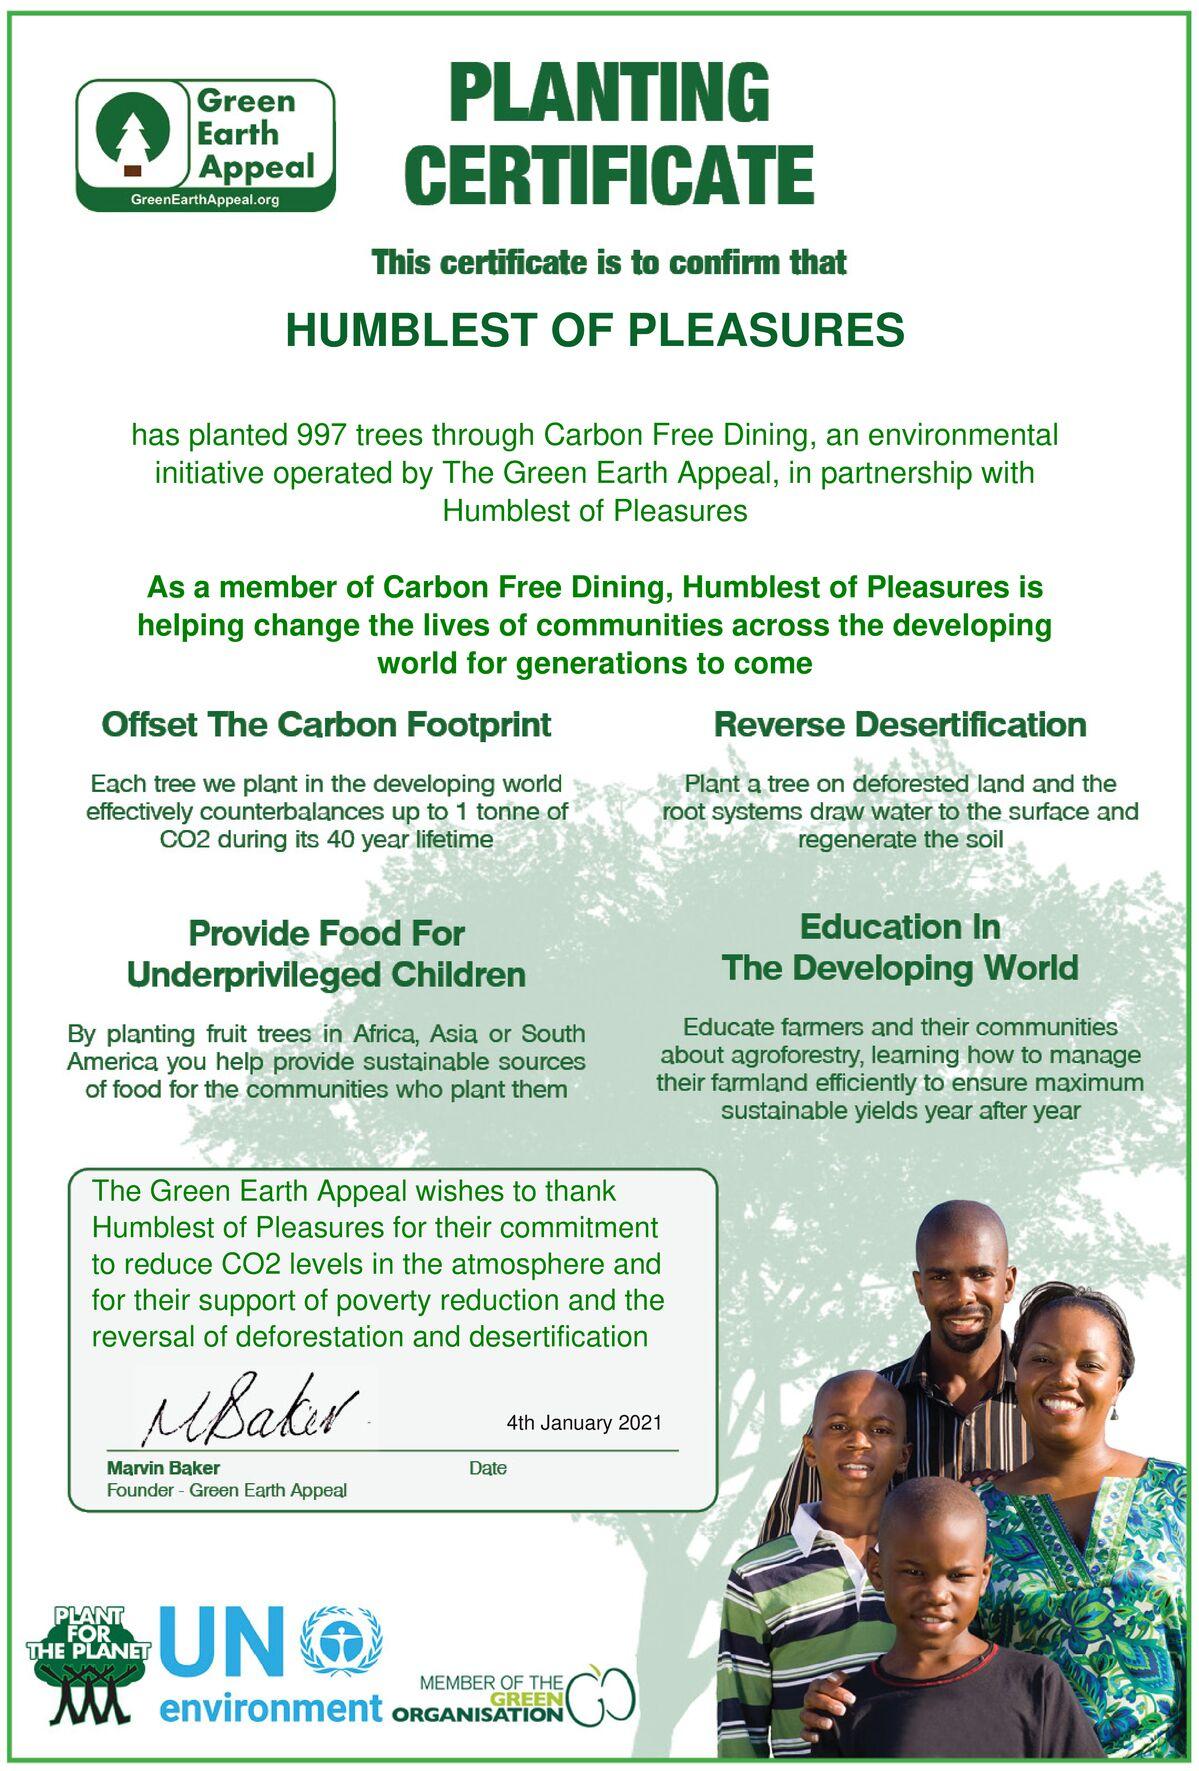 Humblest of Pleasures